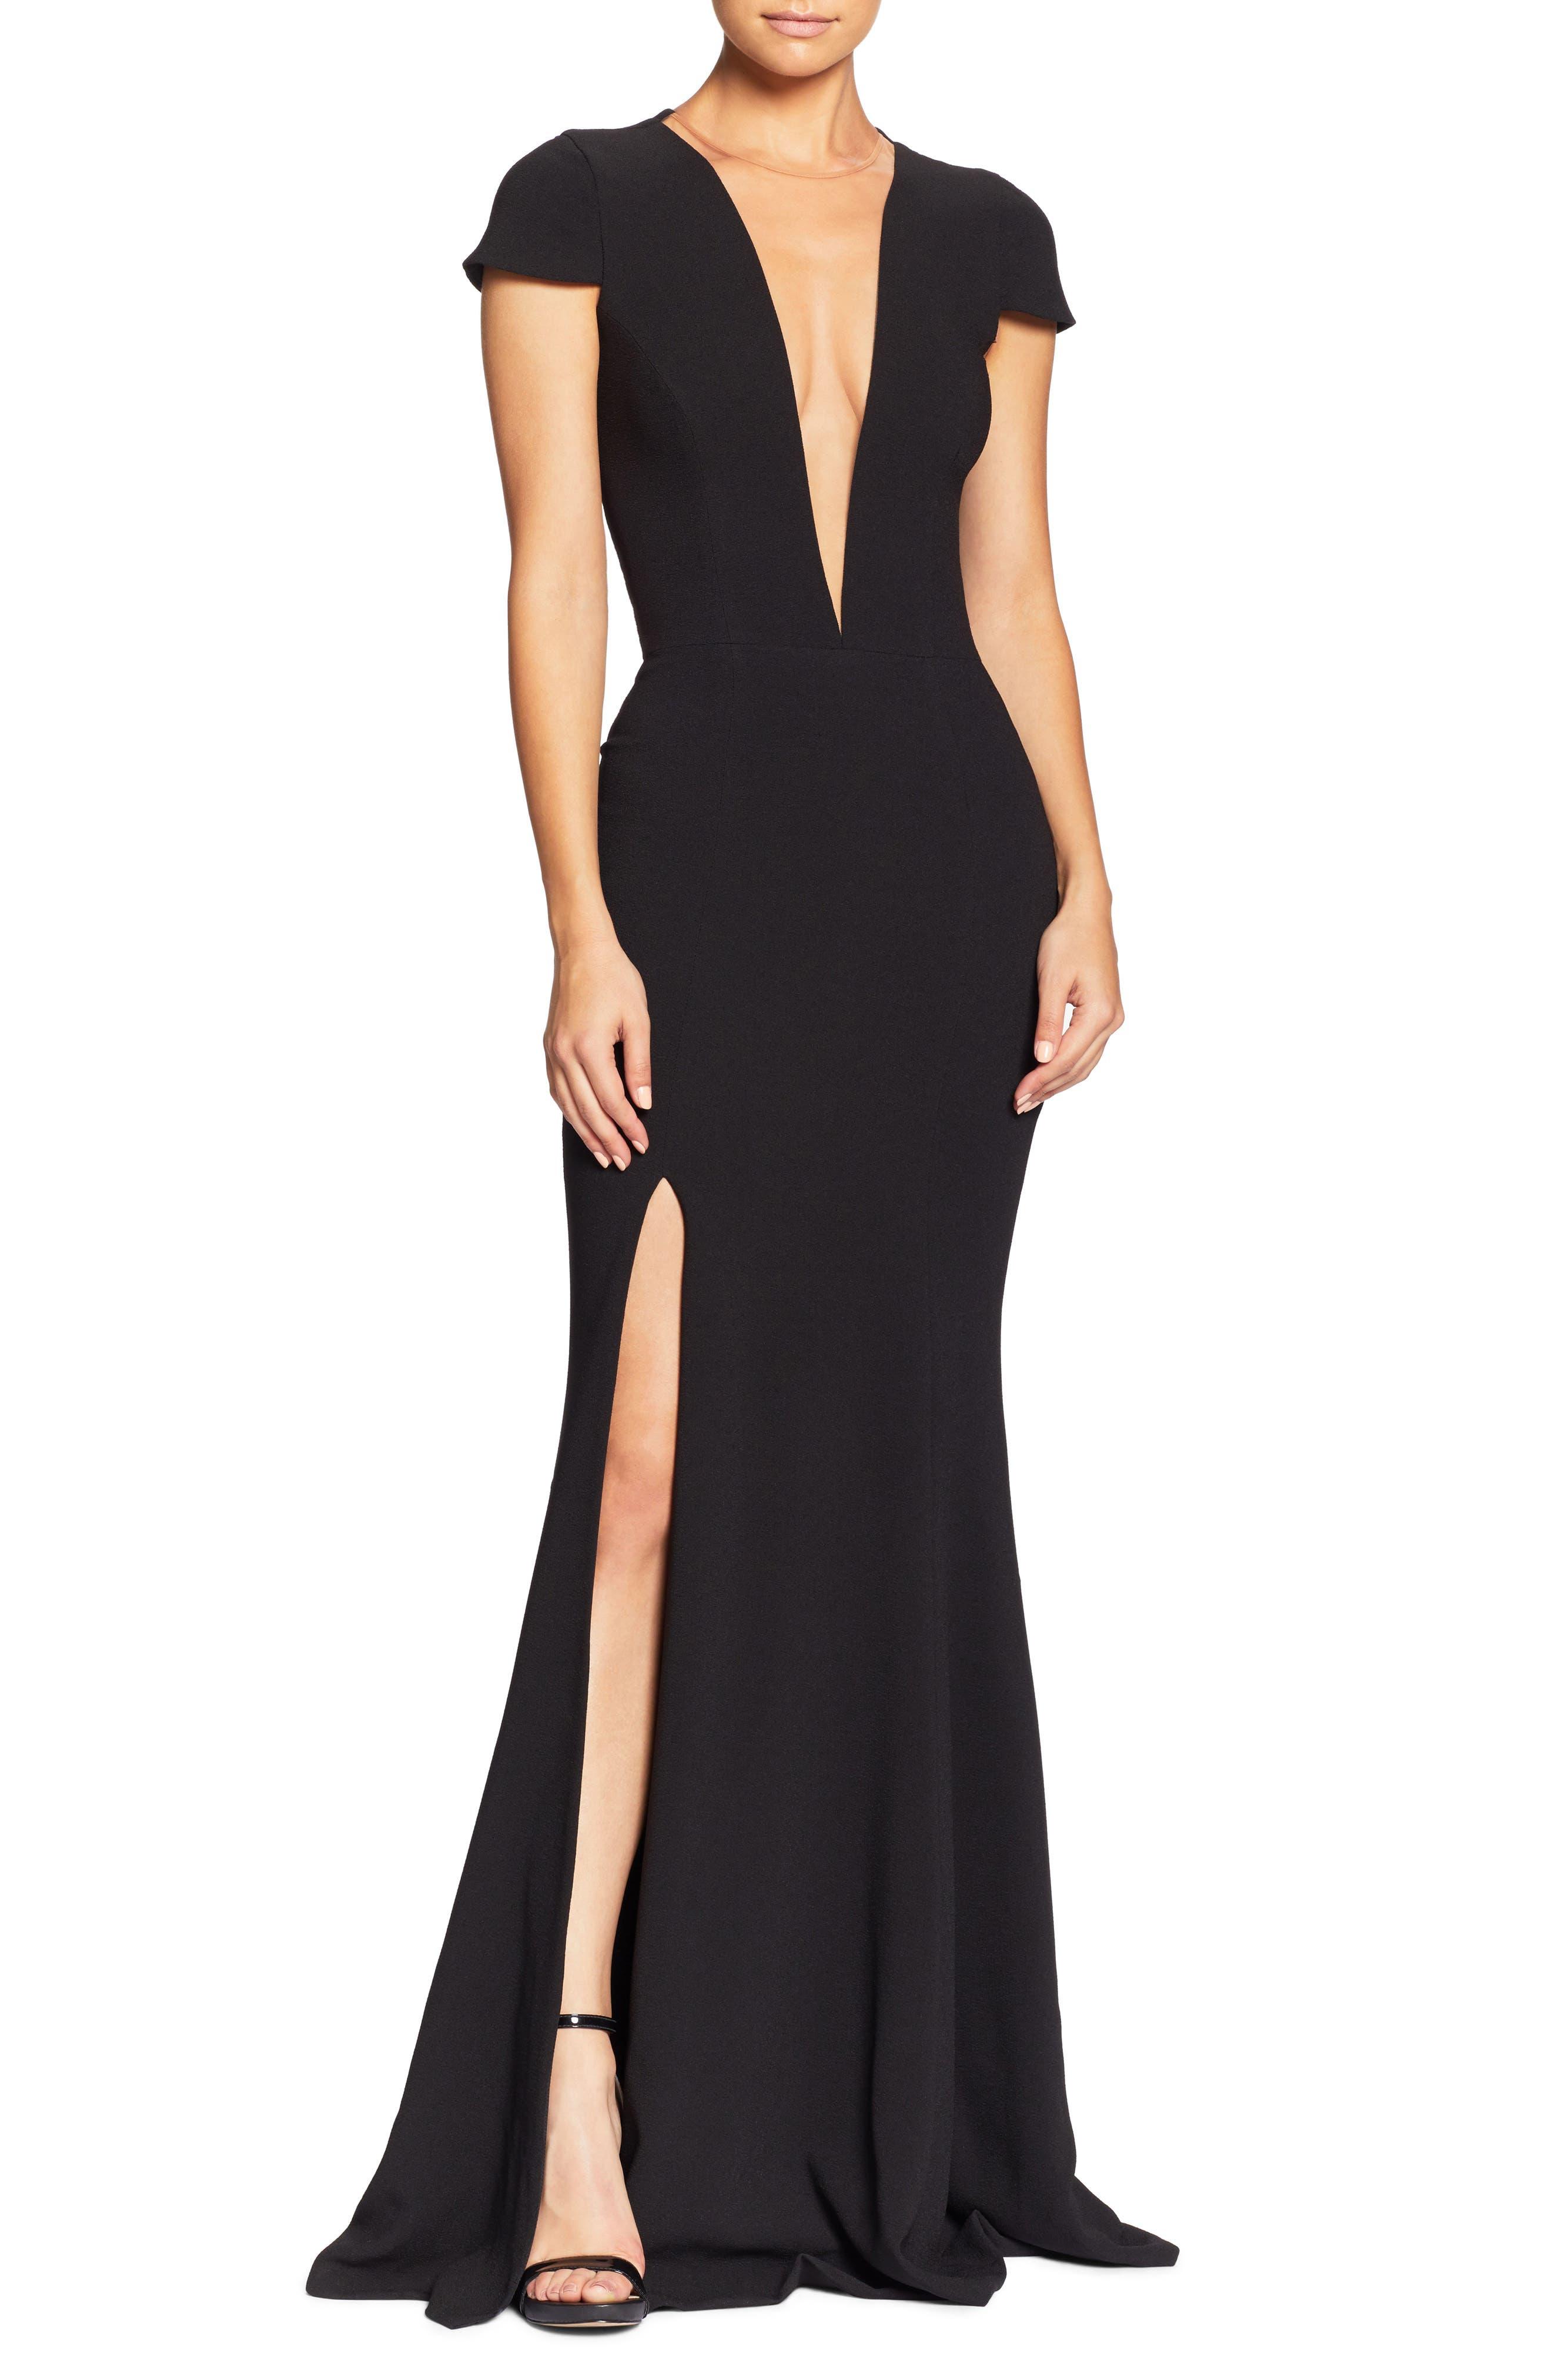 Dress The Population Leah Illusion Inset Crepe Gown, Black